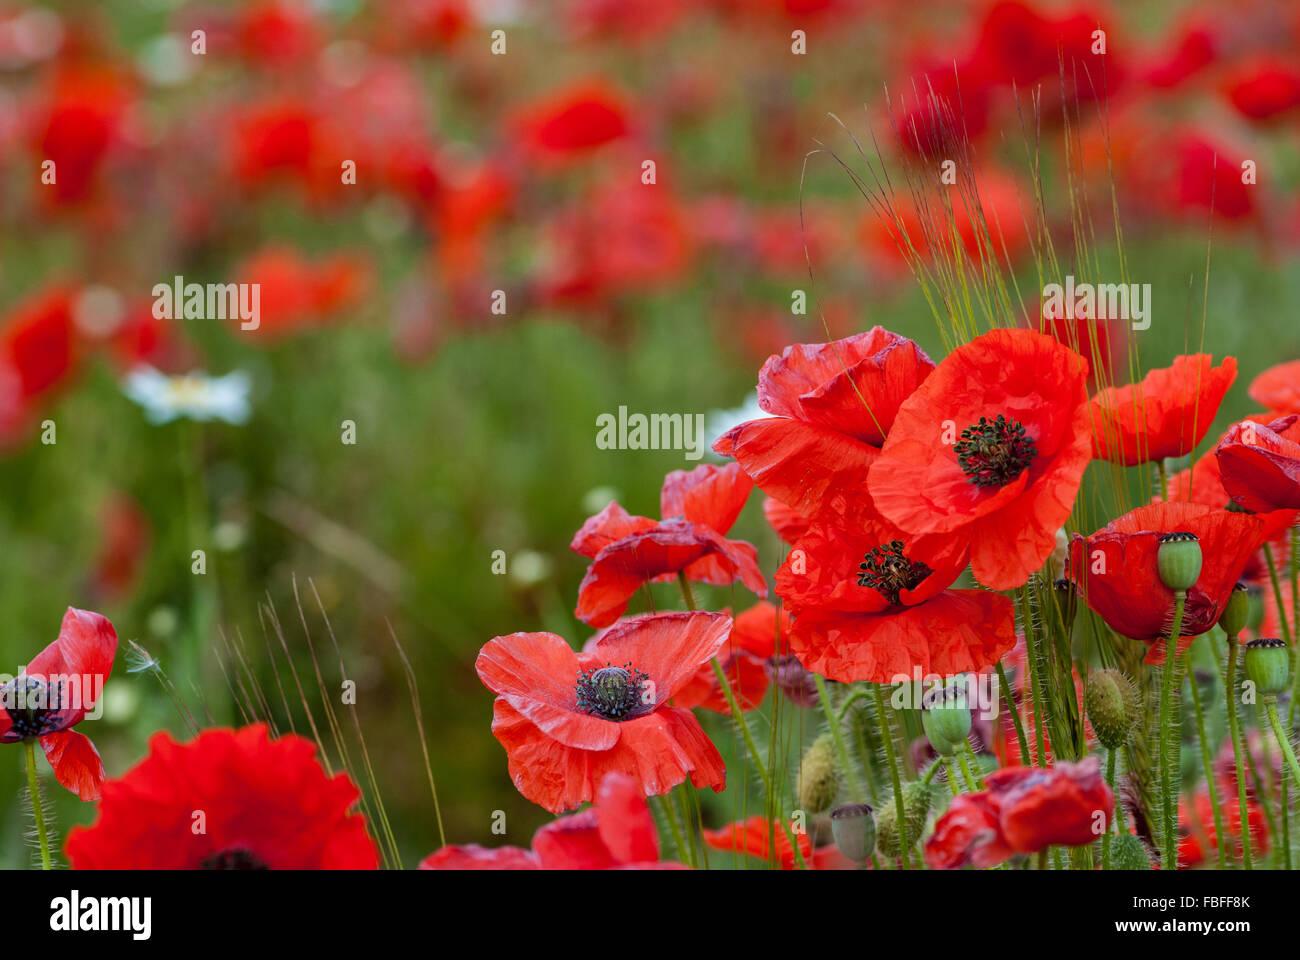 Field of Poppies, England, UK - Stock Image